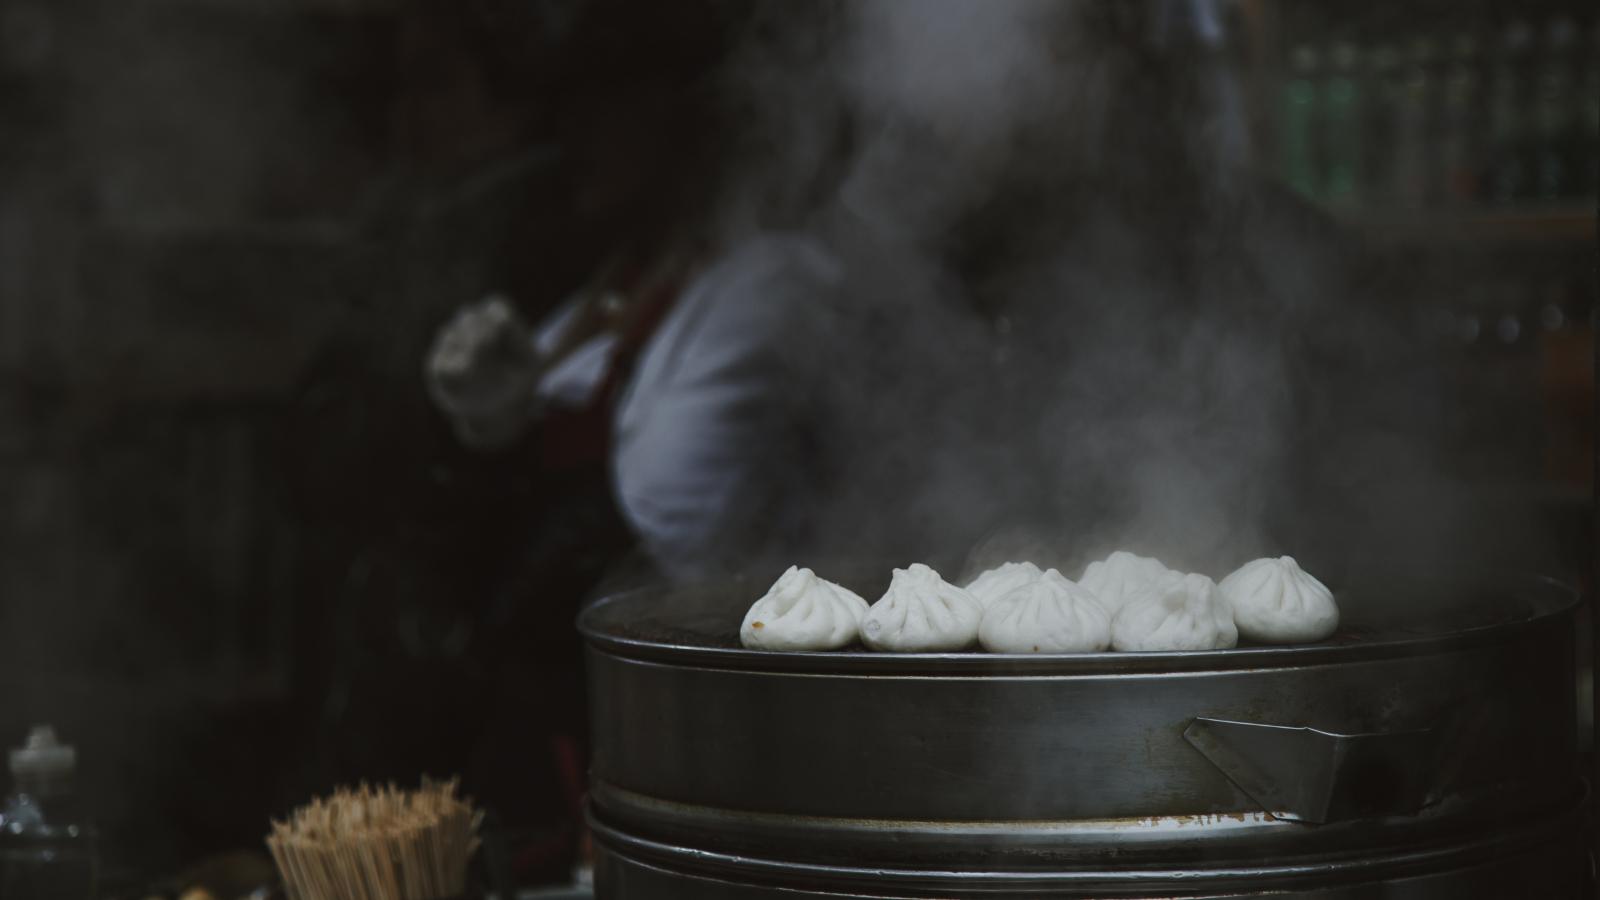 Dampfgarer Vorteile